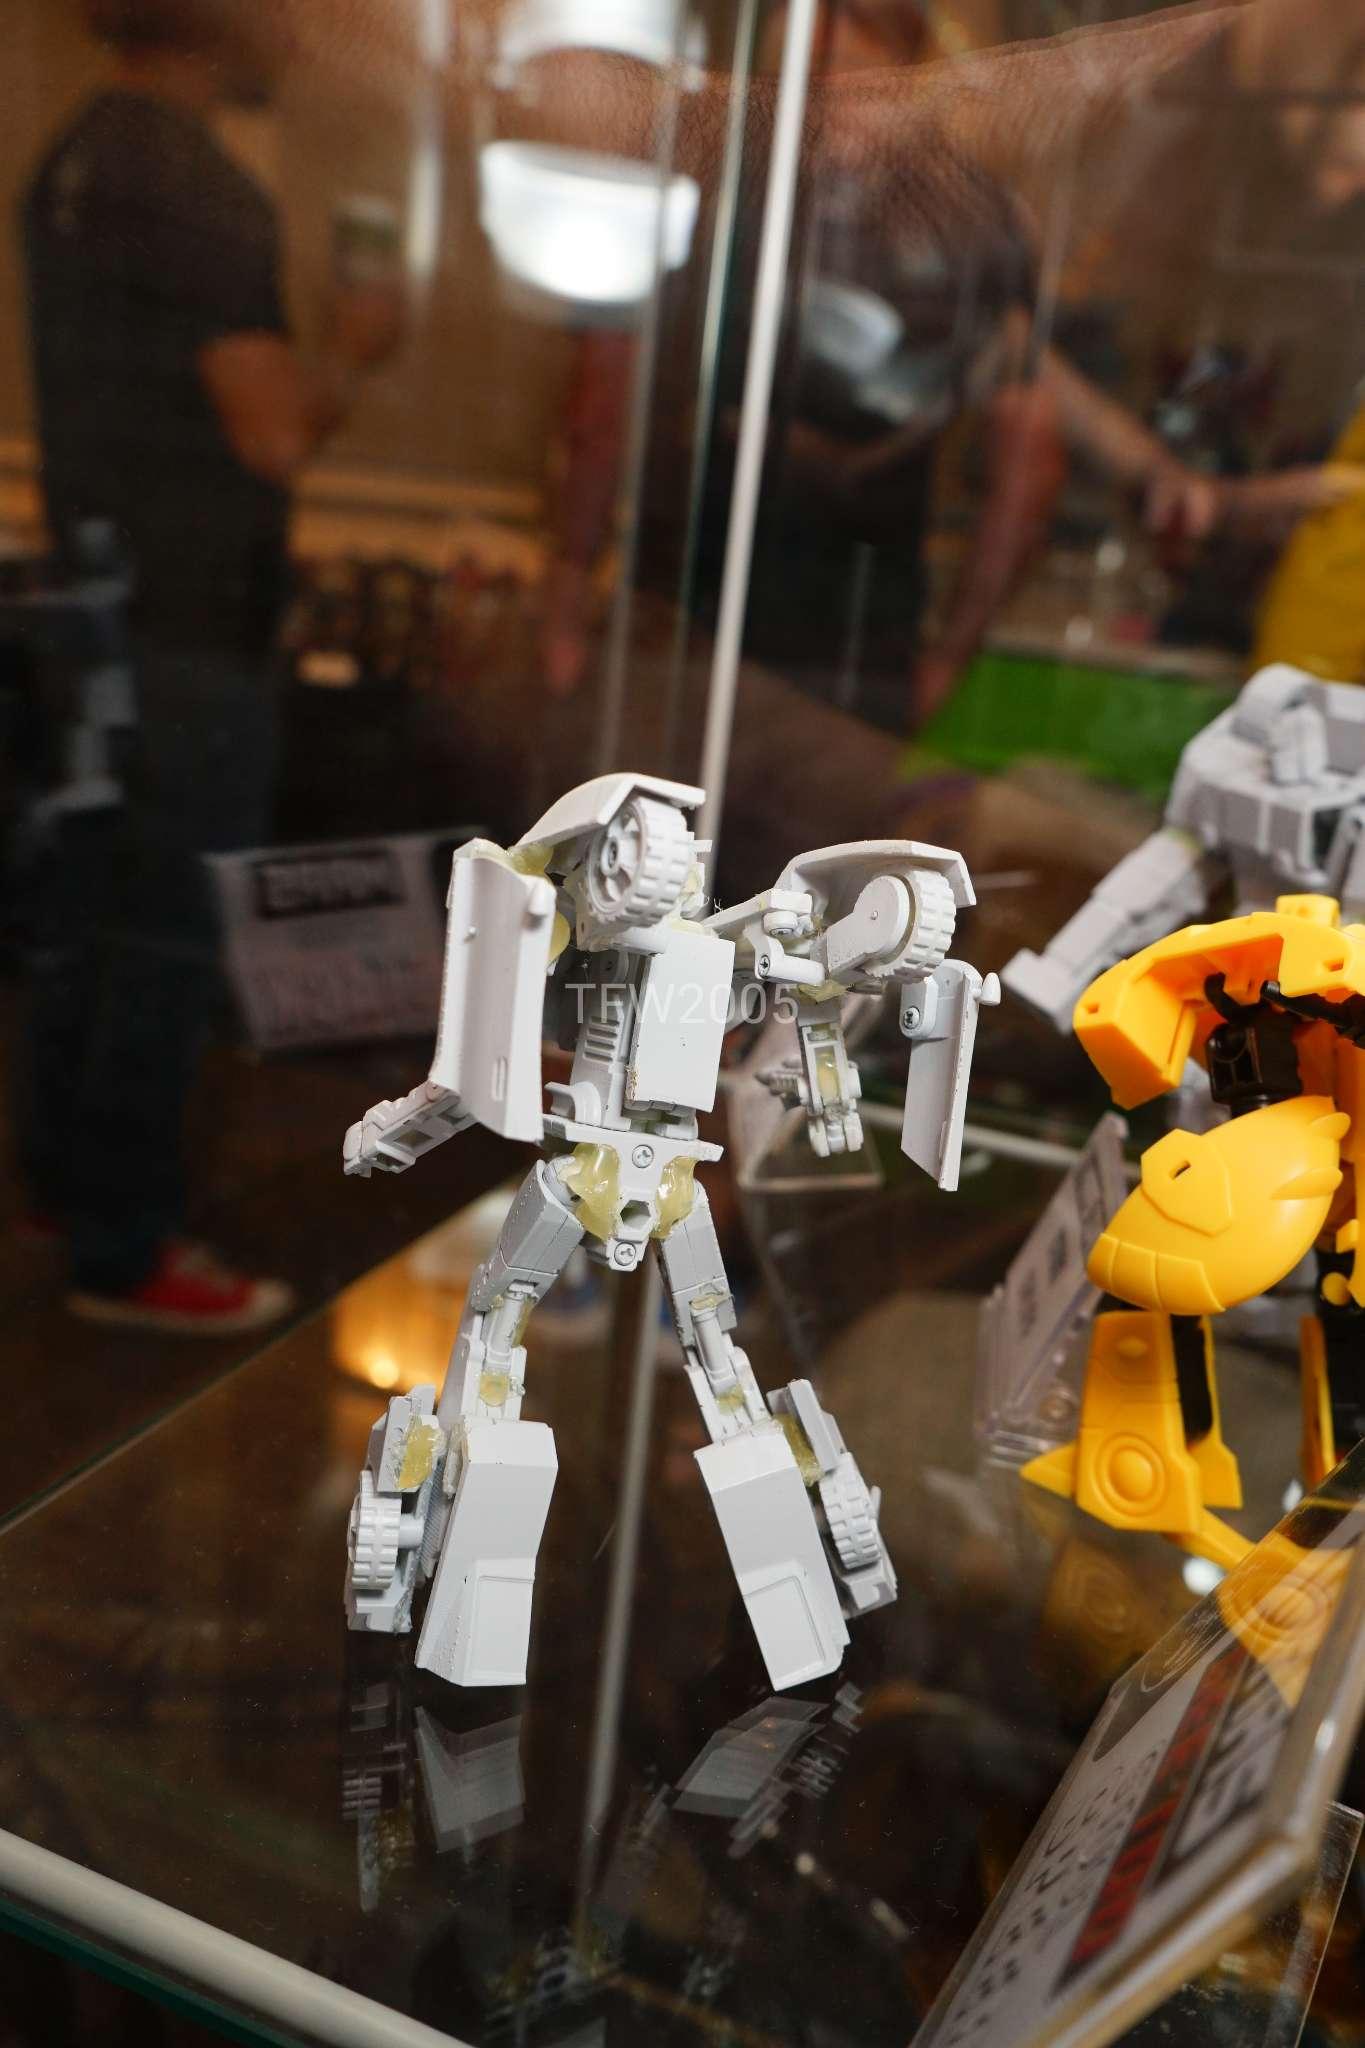 [MAAS Toys] Produit Tiers - Jouets TF de la gamme Cybertech Series (mode Cybertronien) + Gee Too (G2) PvBnvDmp_o